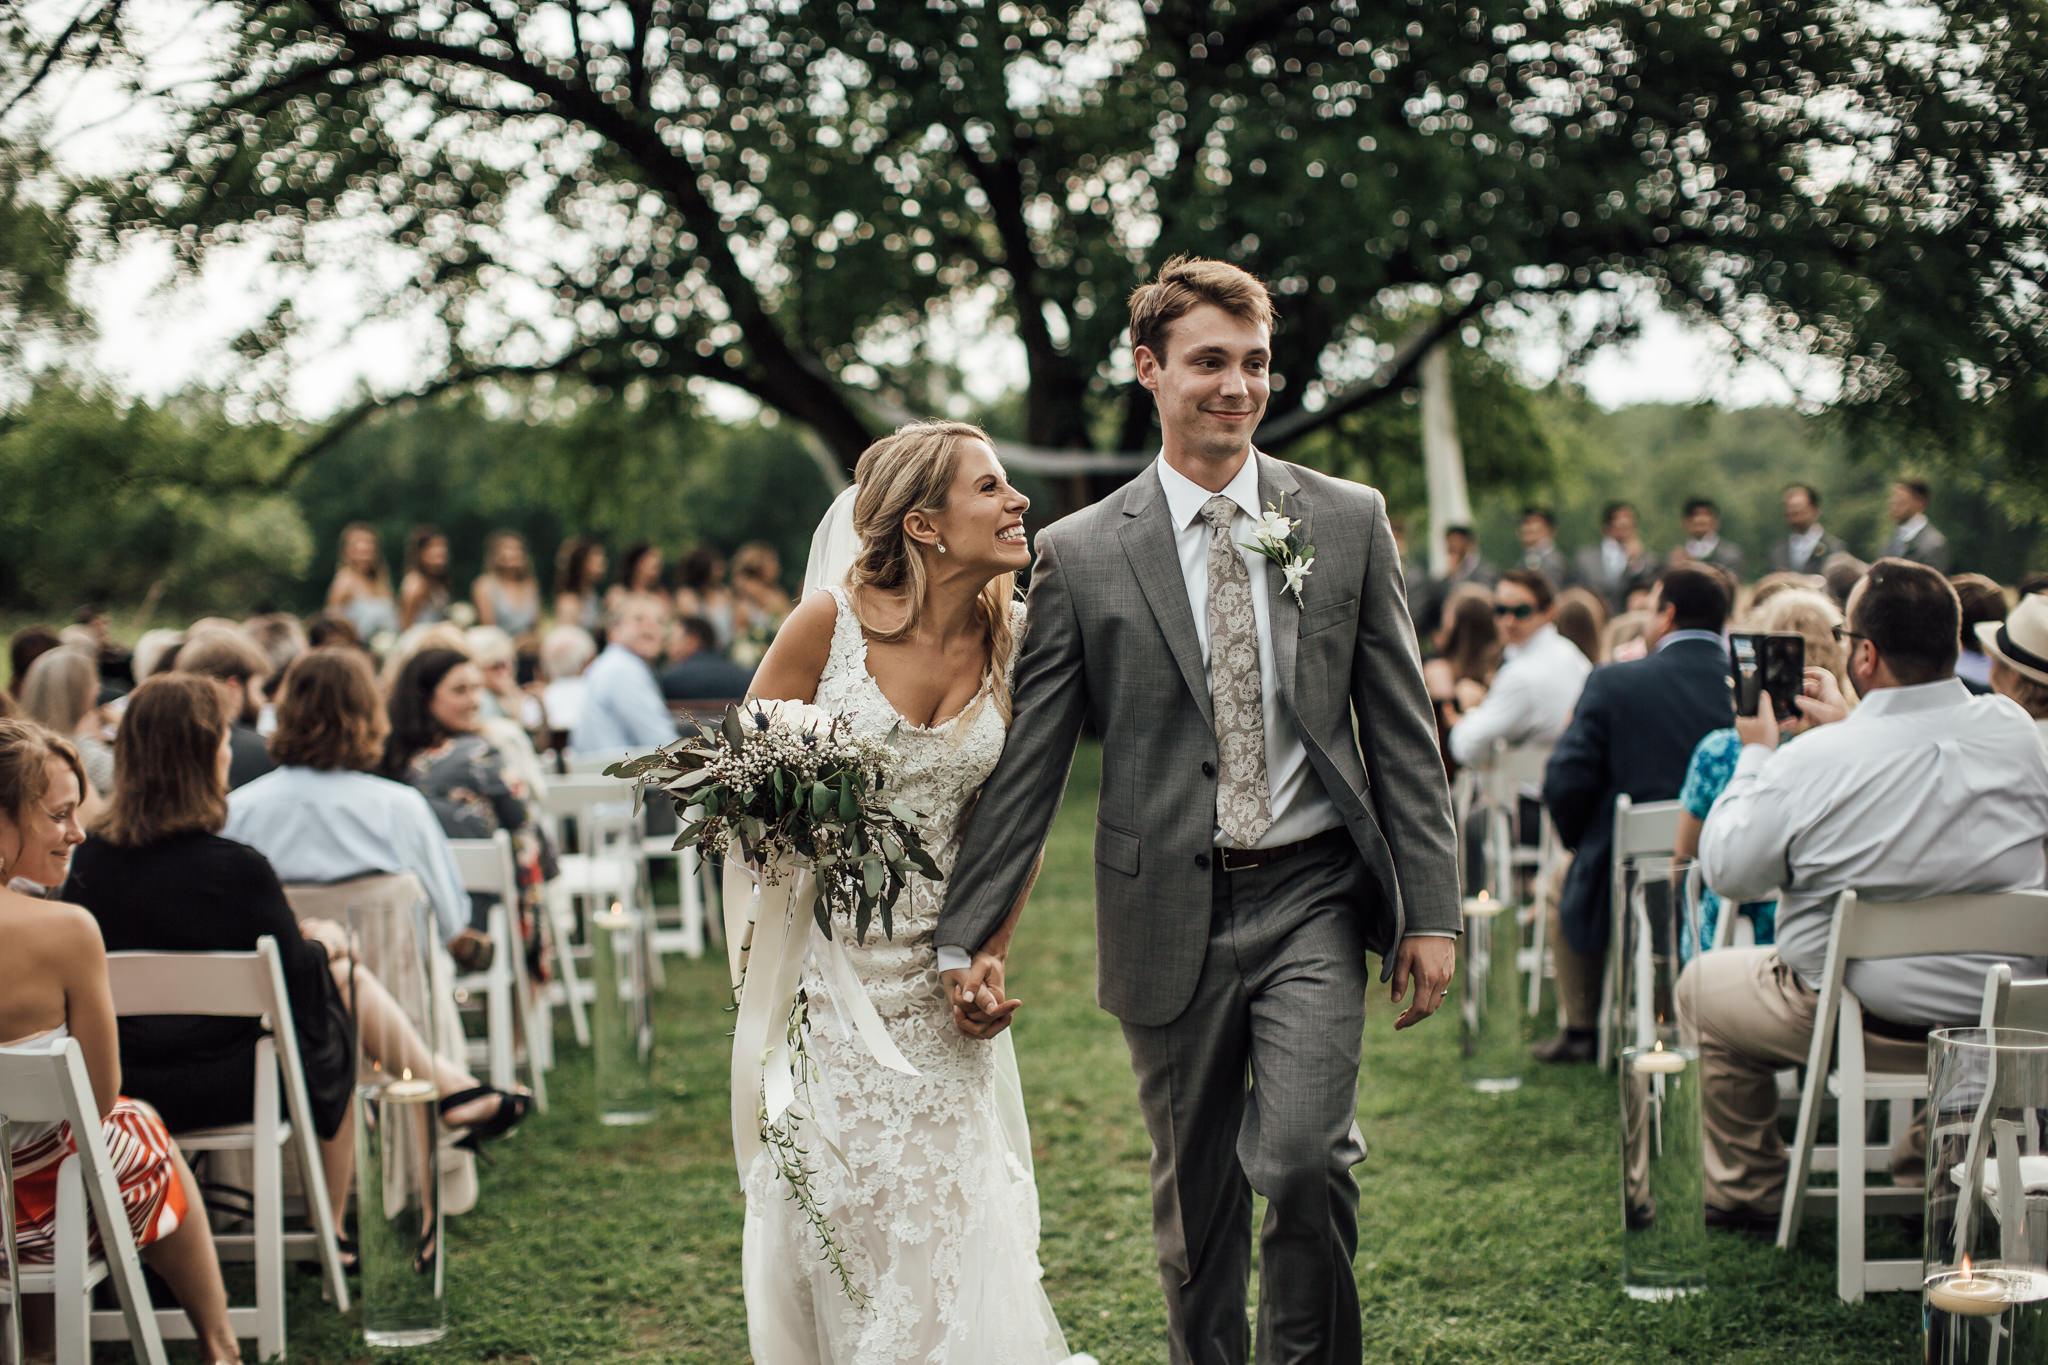 cassie-cook-photography-memphis-wedding-photographer-hedge-farm-wedding-venue-7.jpg